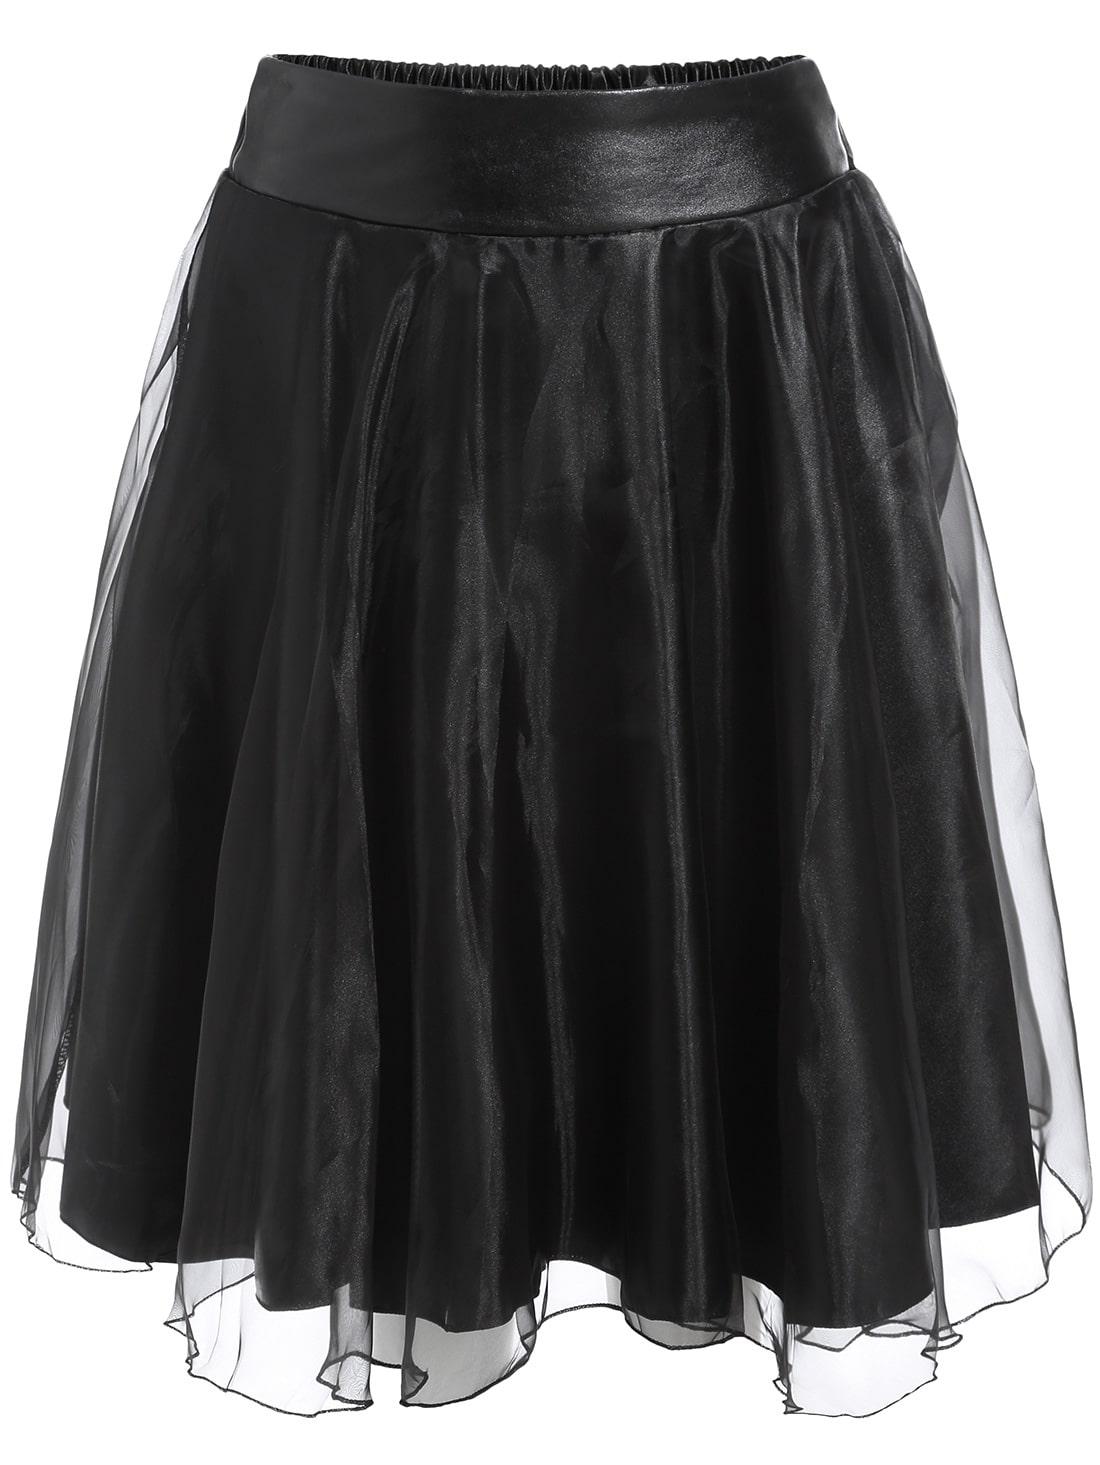 Black Sheer Mesh PU Skirt